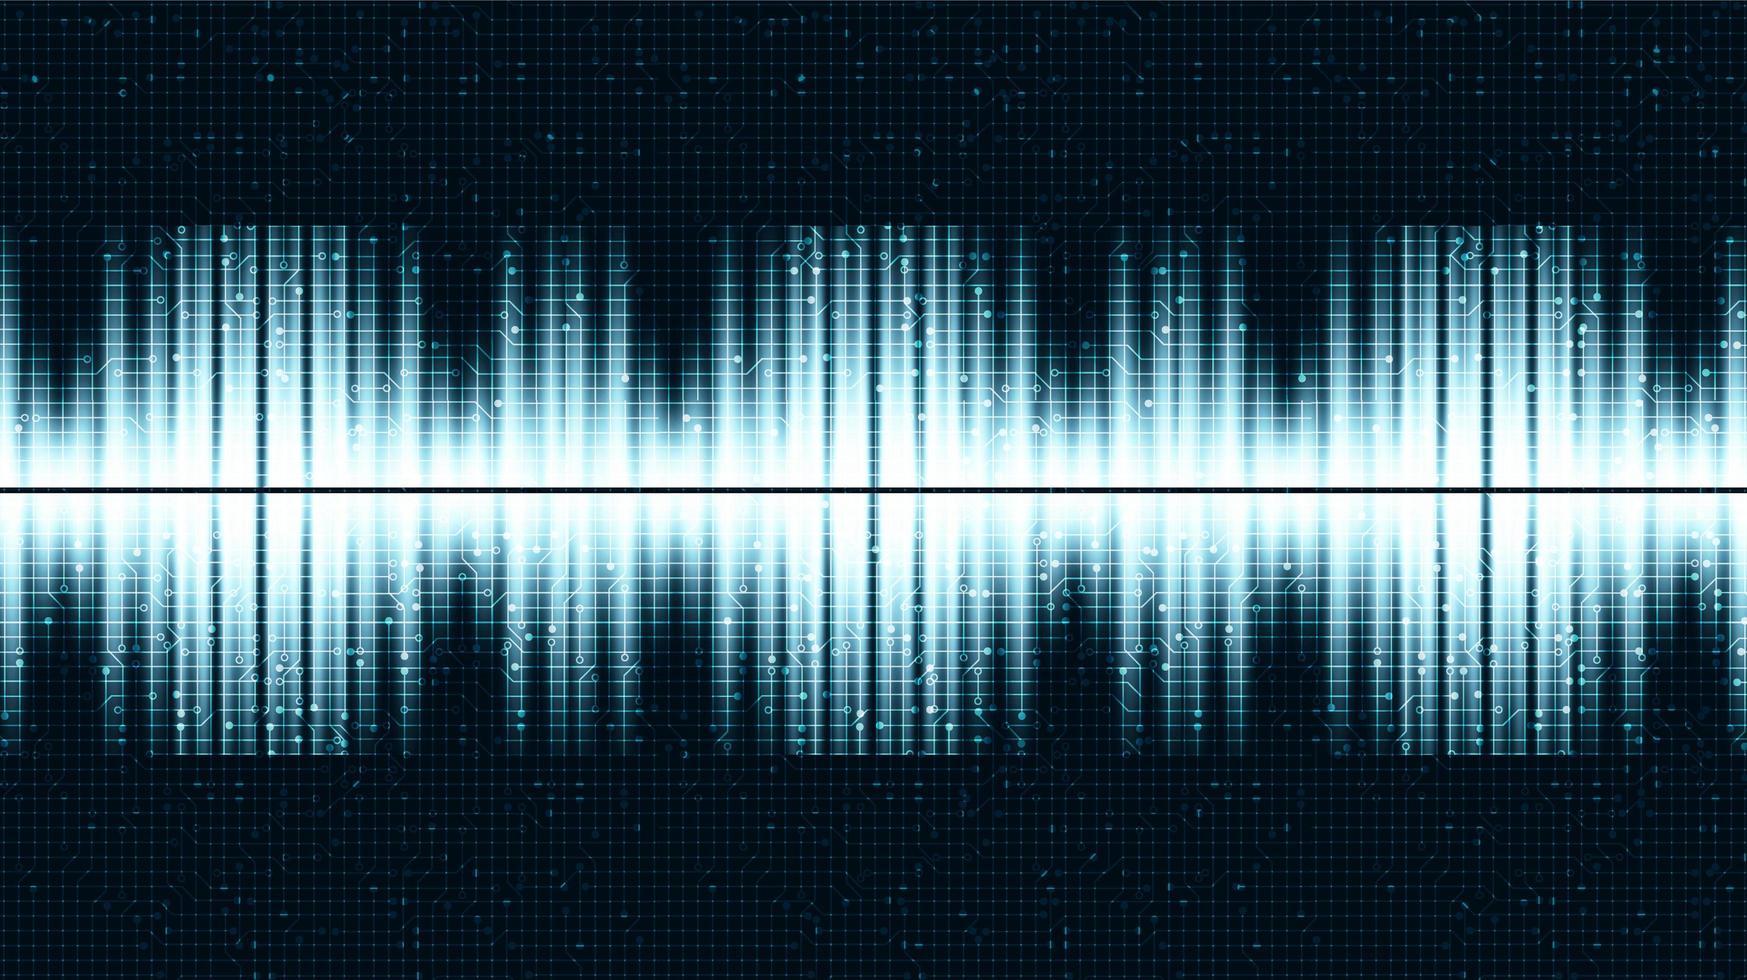 fondo de onda de sonido ultrasónico vector